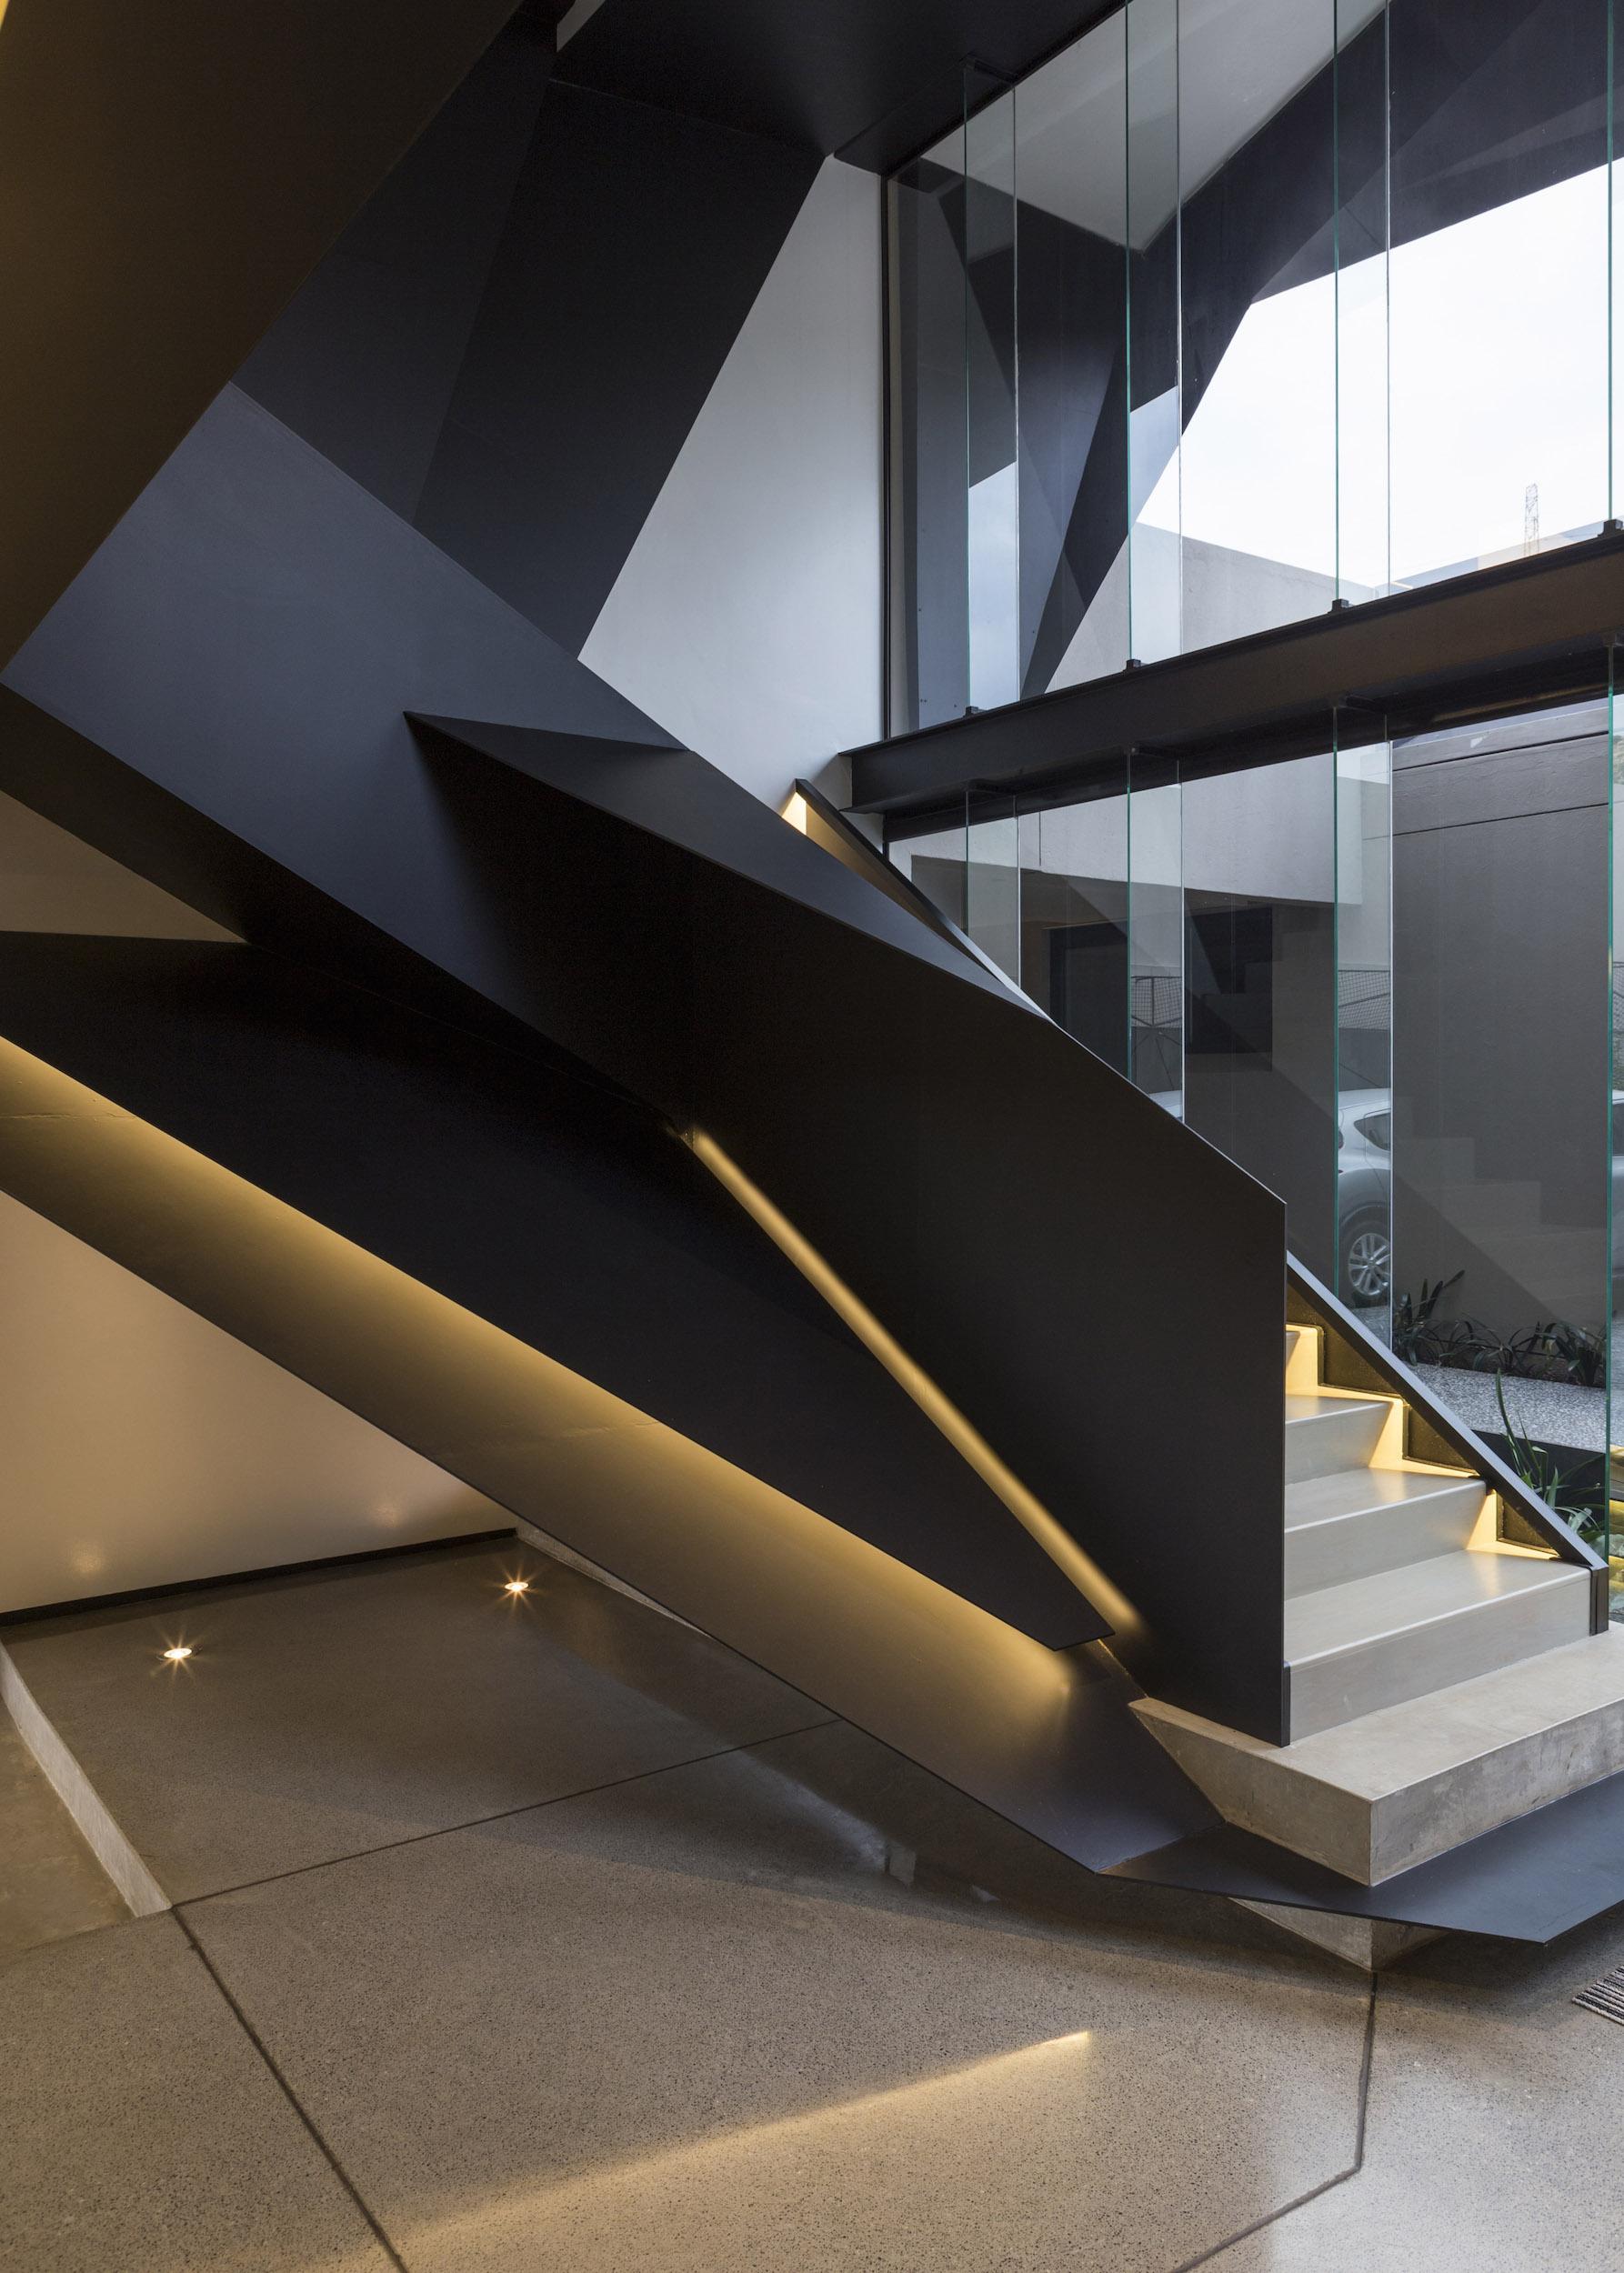 Kloof Road Masterpiece House in Johannesburg by Nico van der Meulen Architects-05